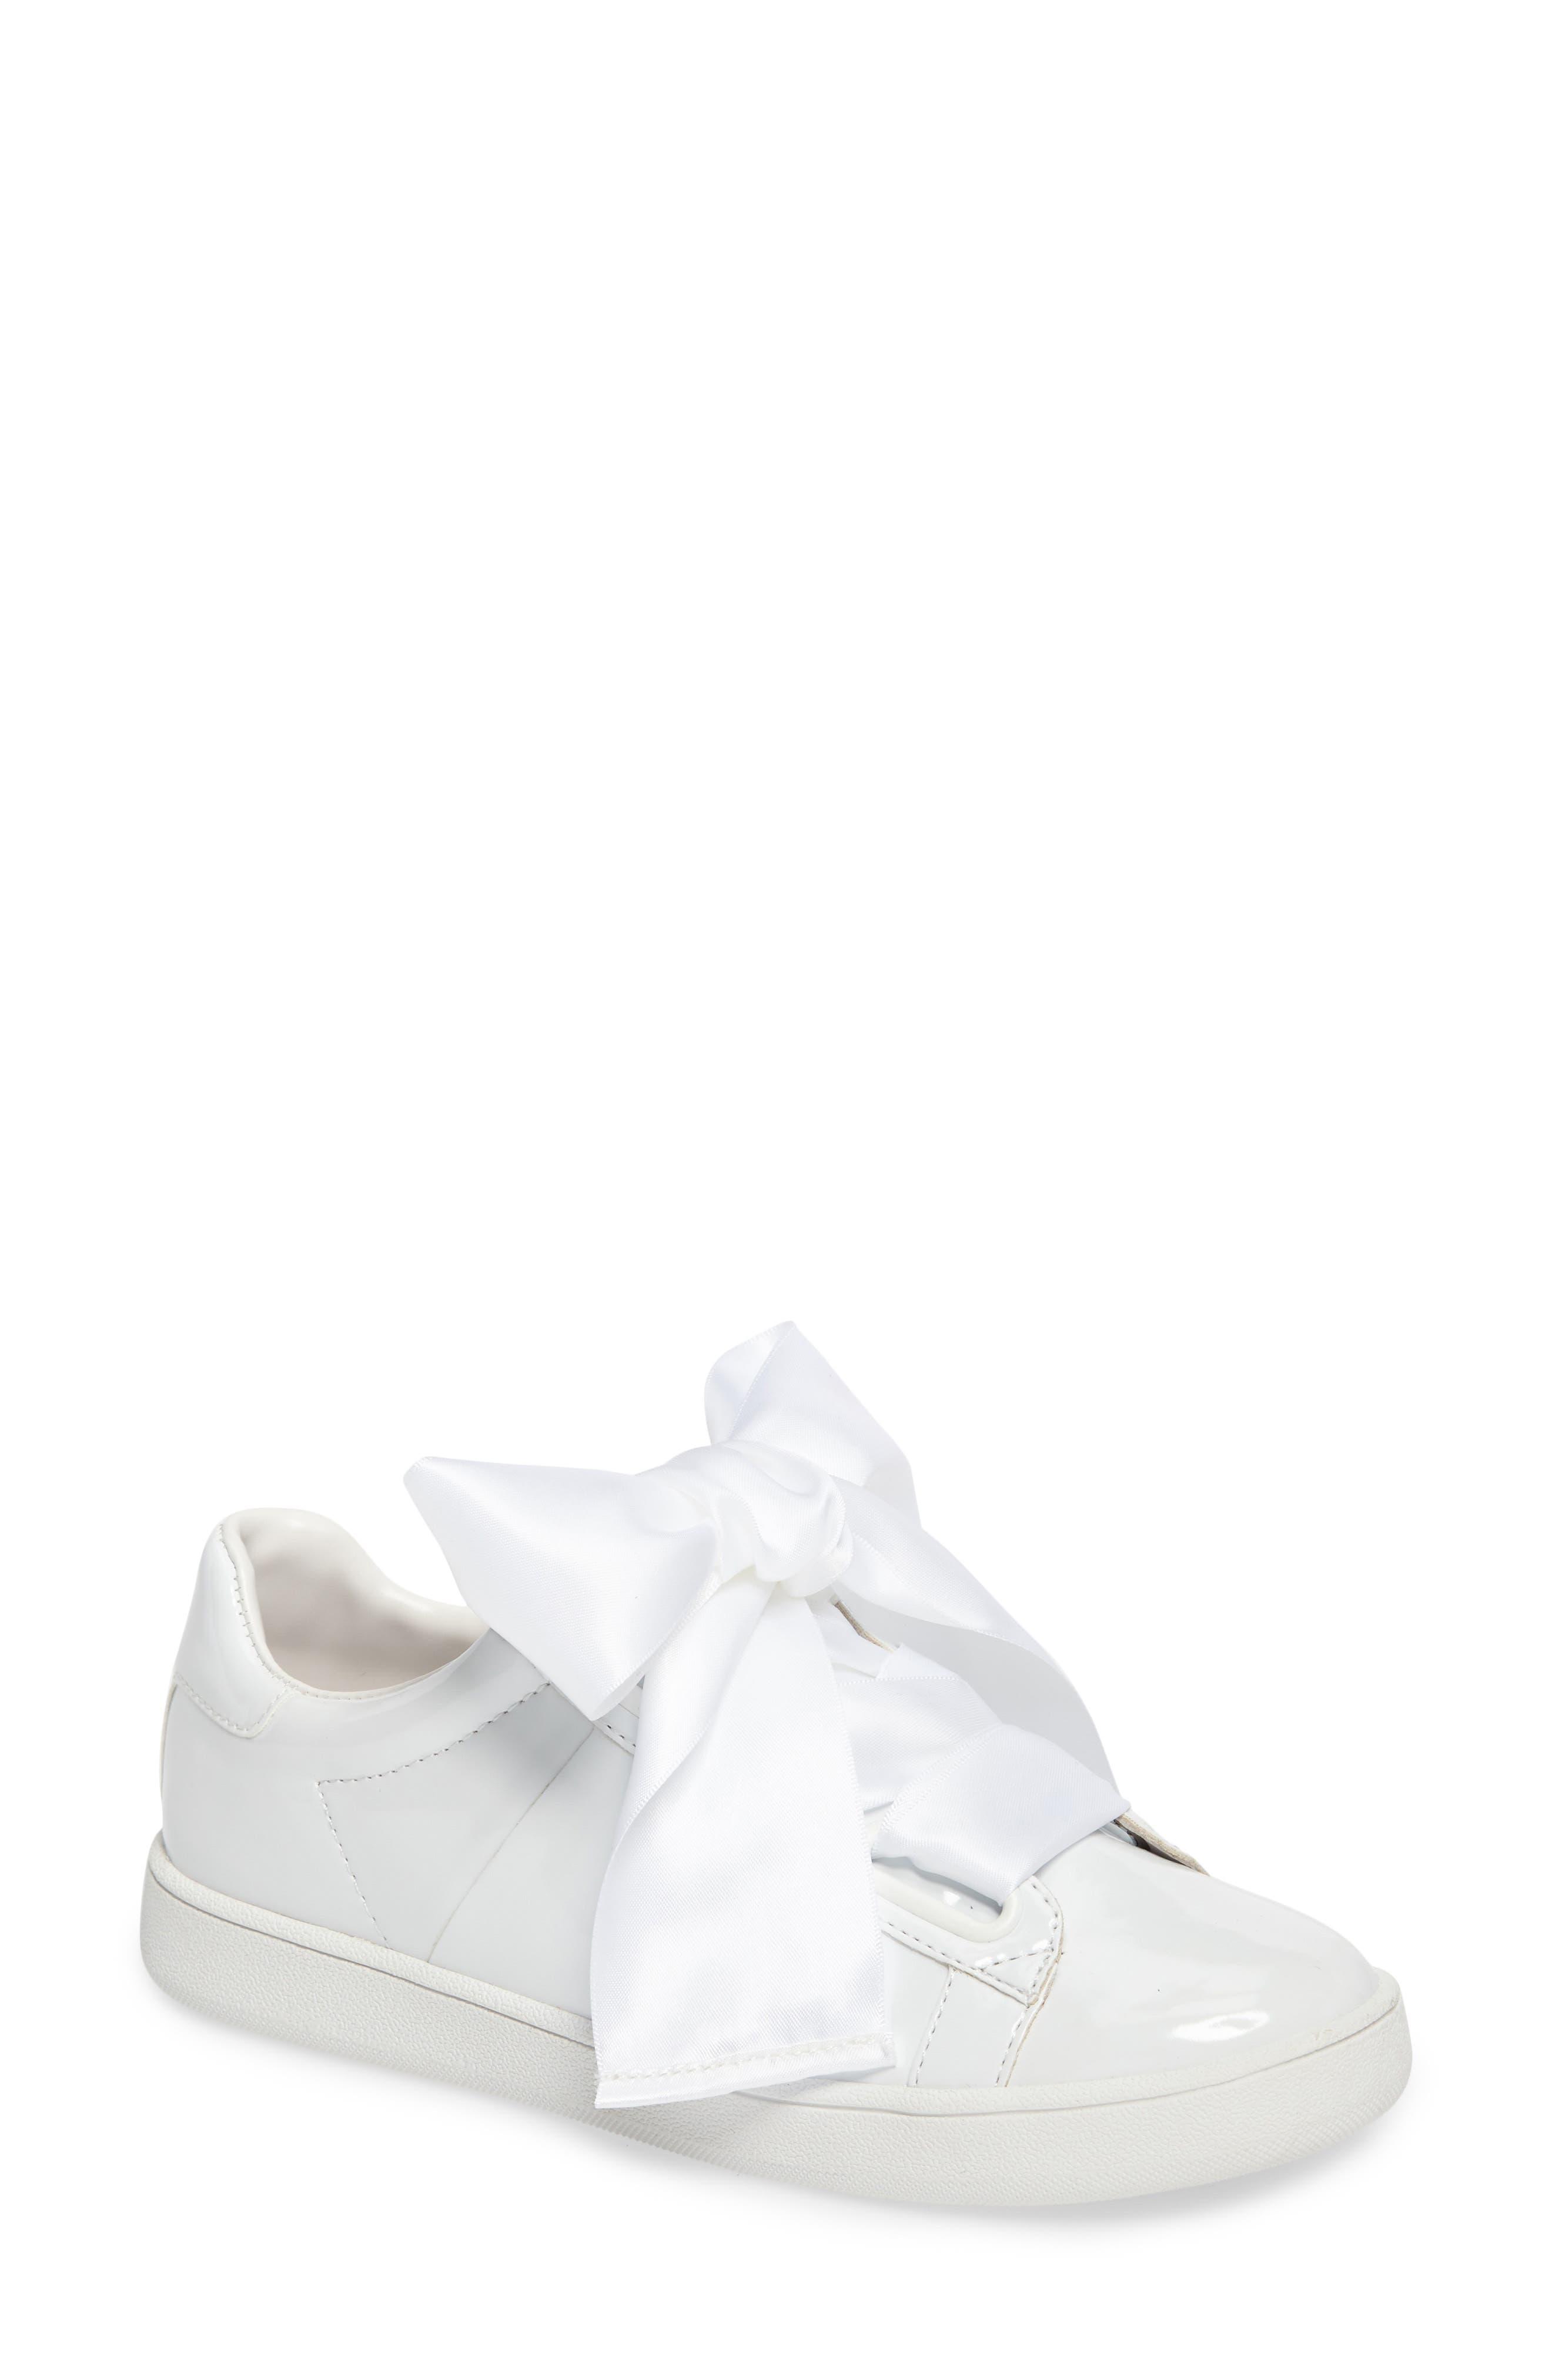 Pabst Low-Top Sneaker,                             Main thumbnail 3, color,